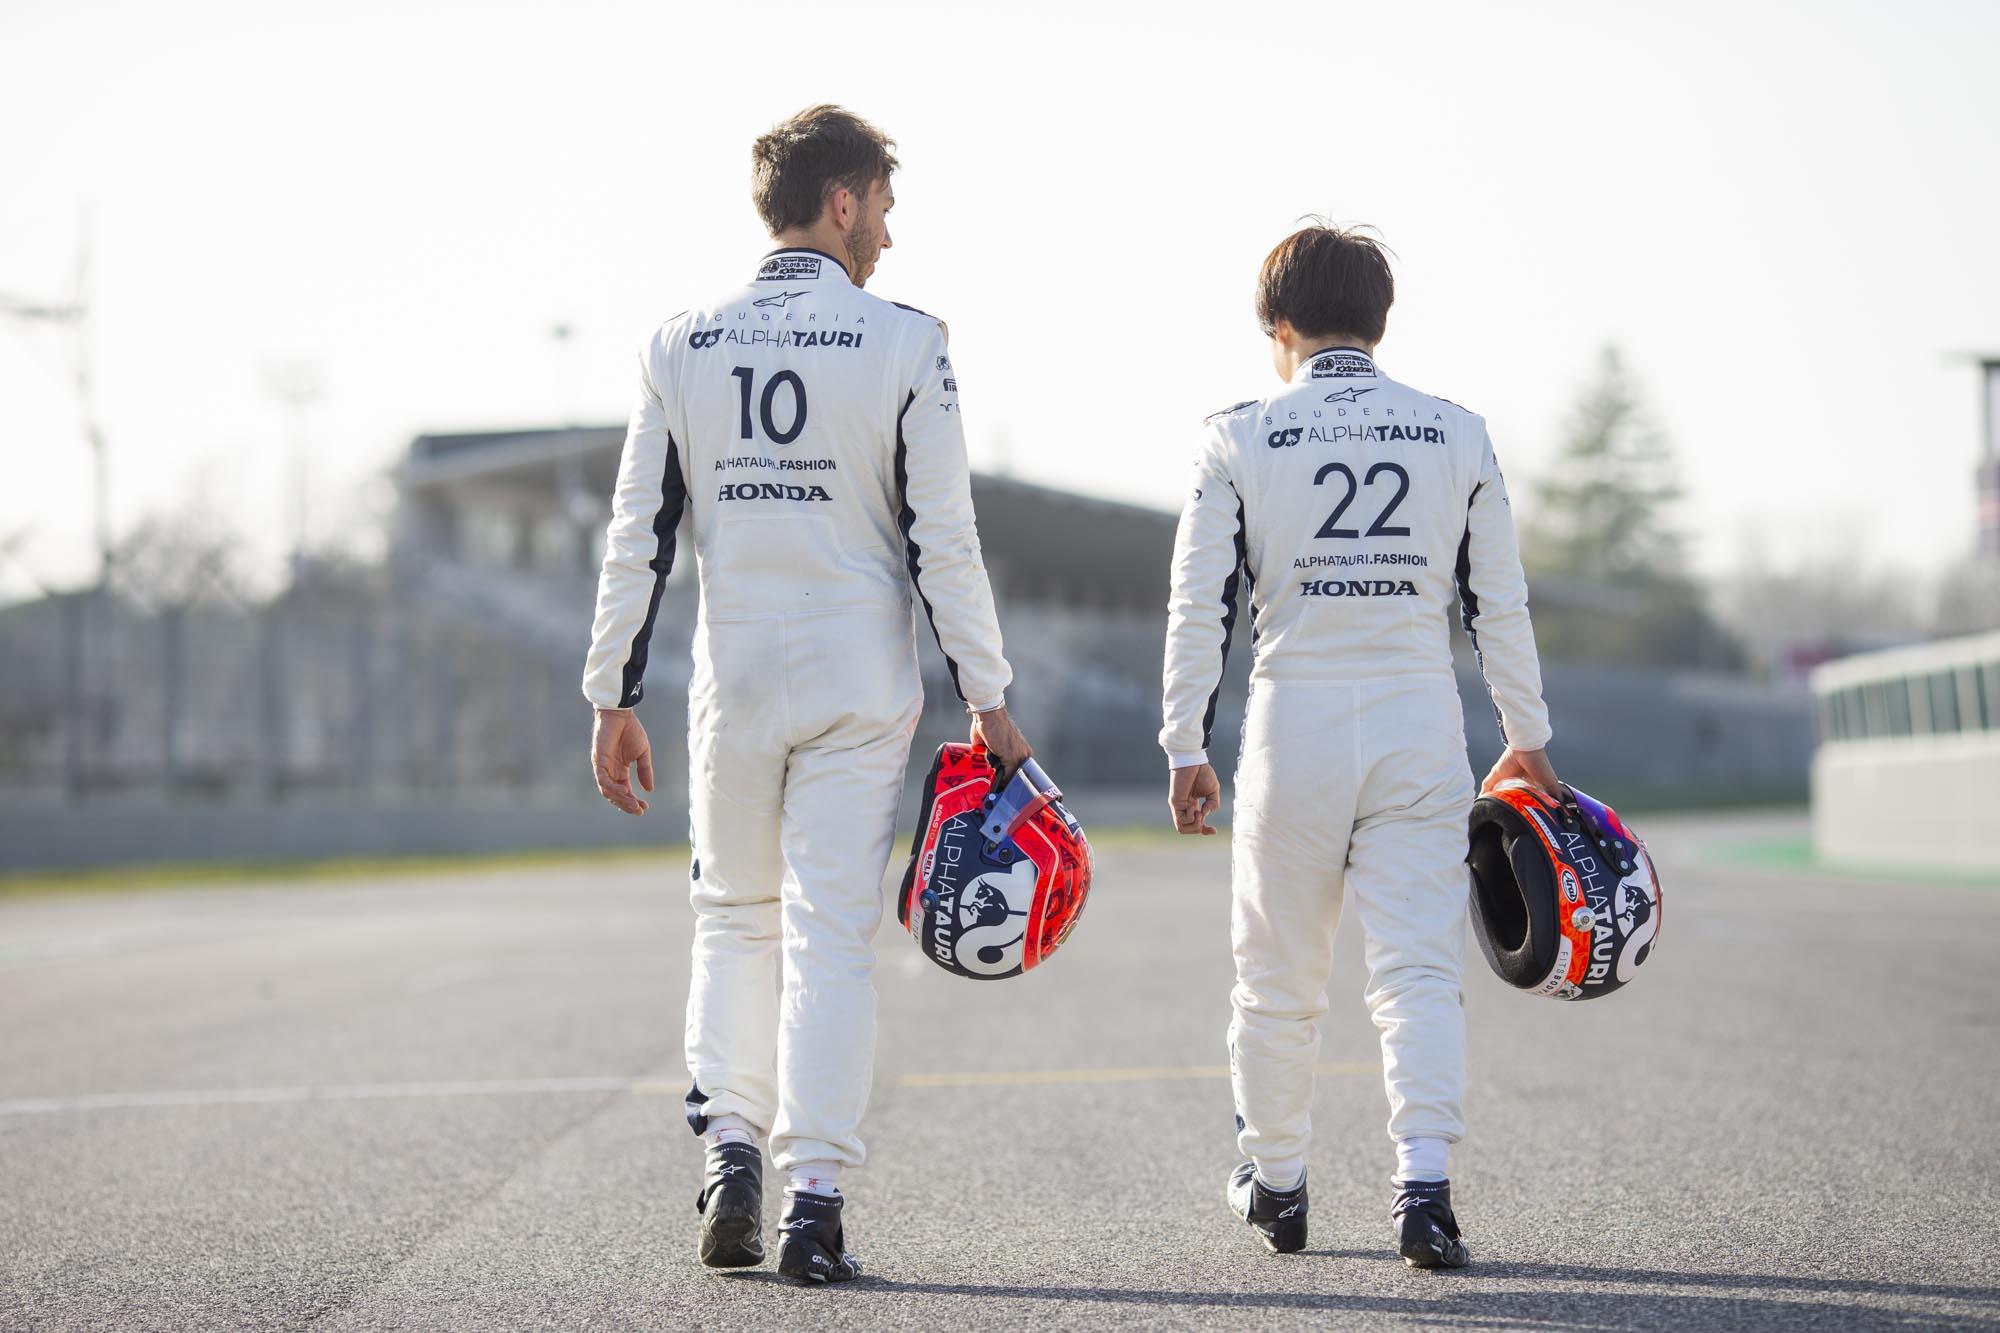 F1 - Officiel : Gasly et Tsunoda confirmés chez AlphaTauri en 2022